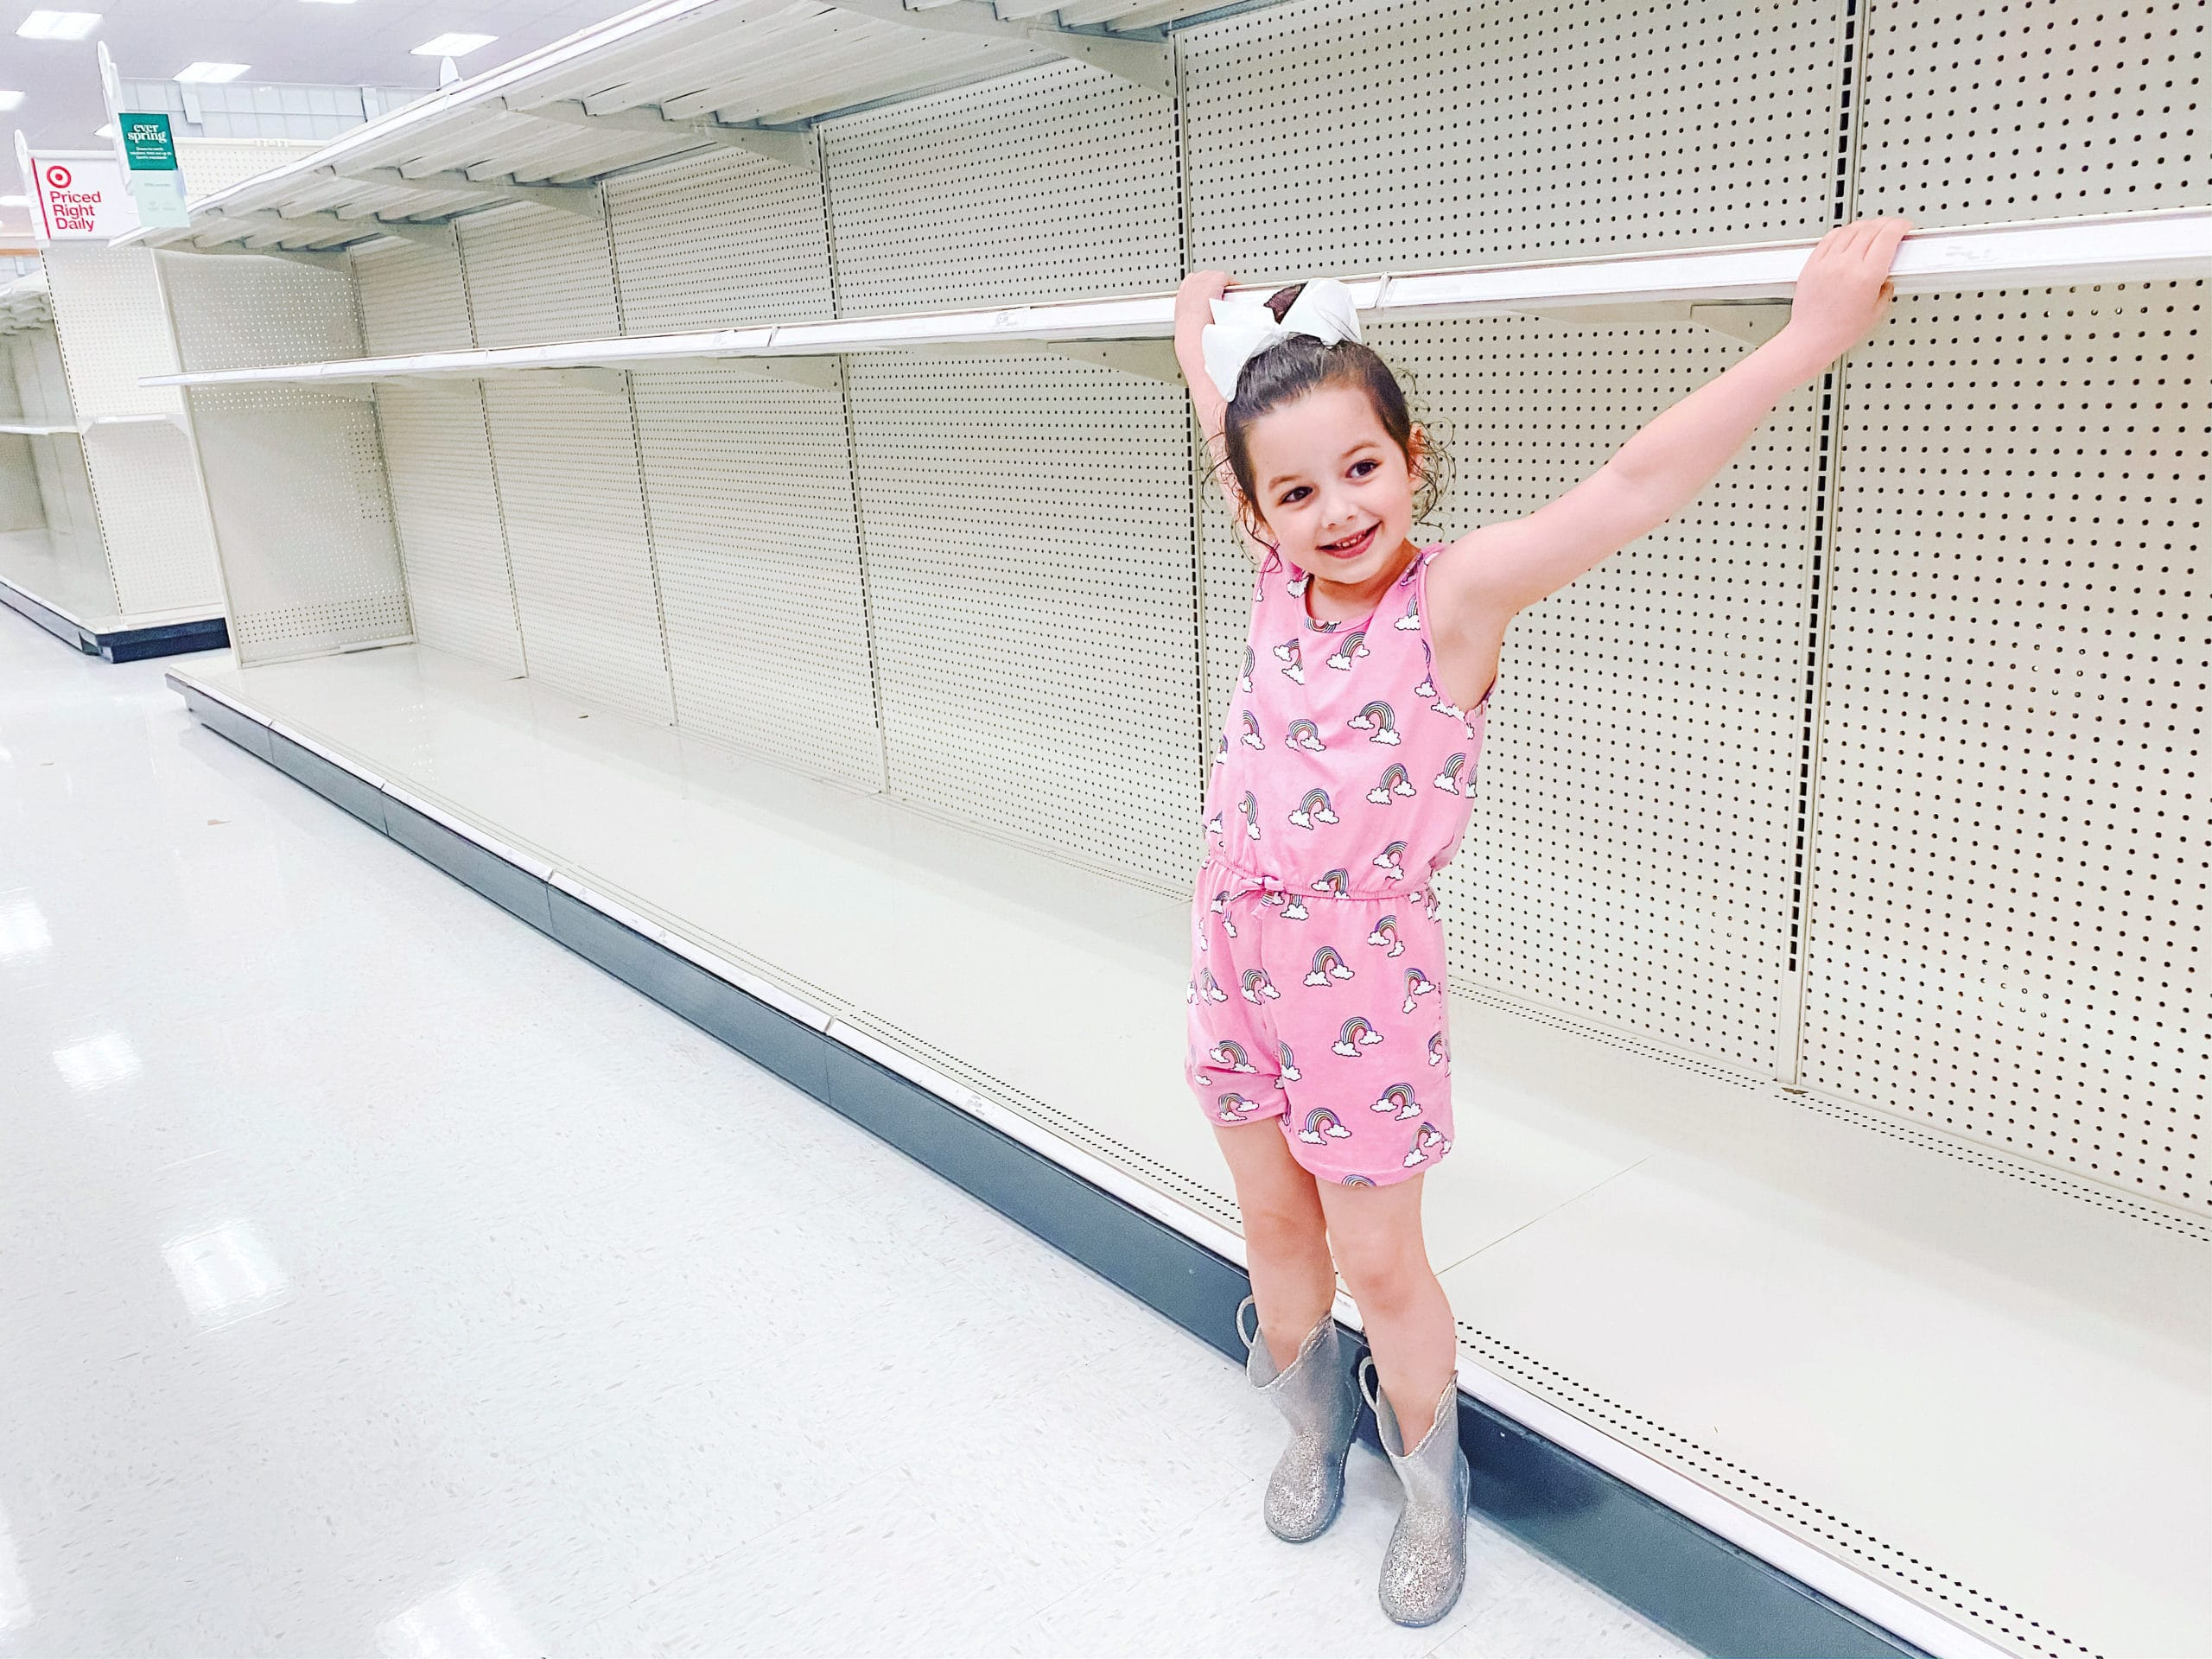 Stephanie Hanrahan's daughter at empty shelves from coronavirus panic